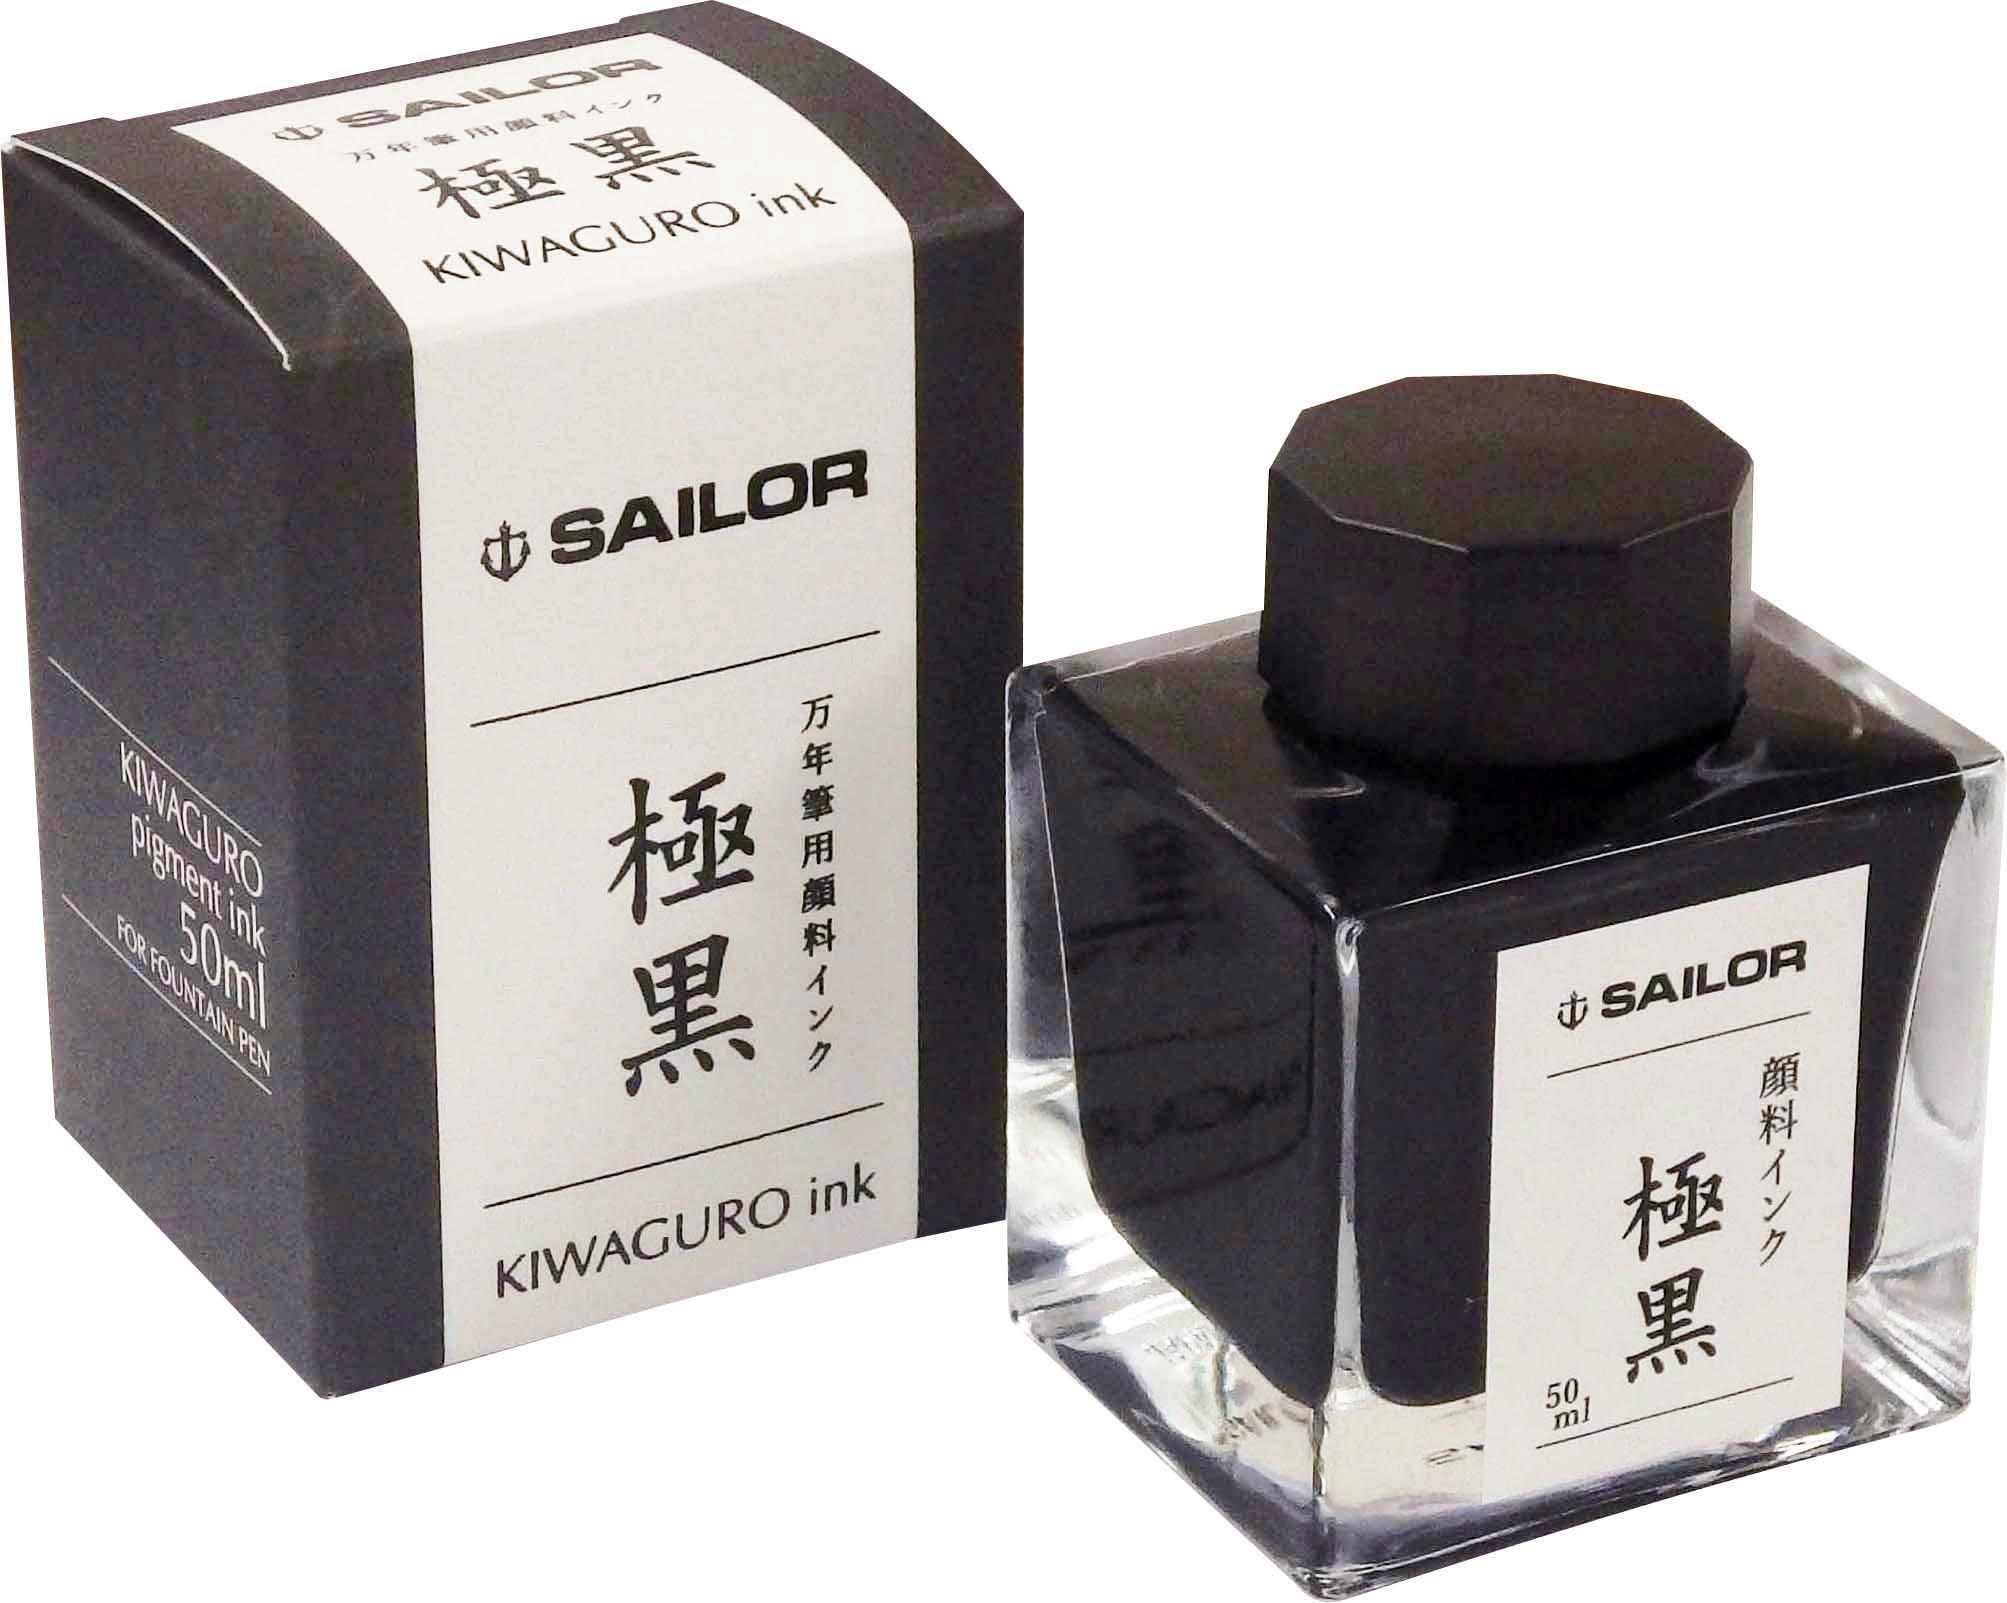 Sailor Kiwa-Guro Pigmented Black Ink Bottle